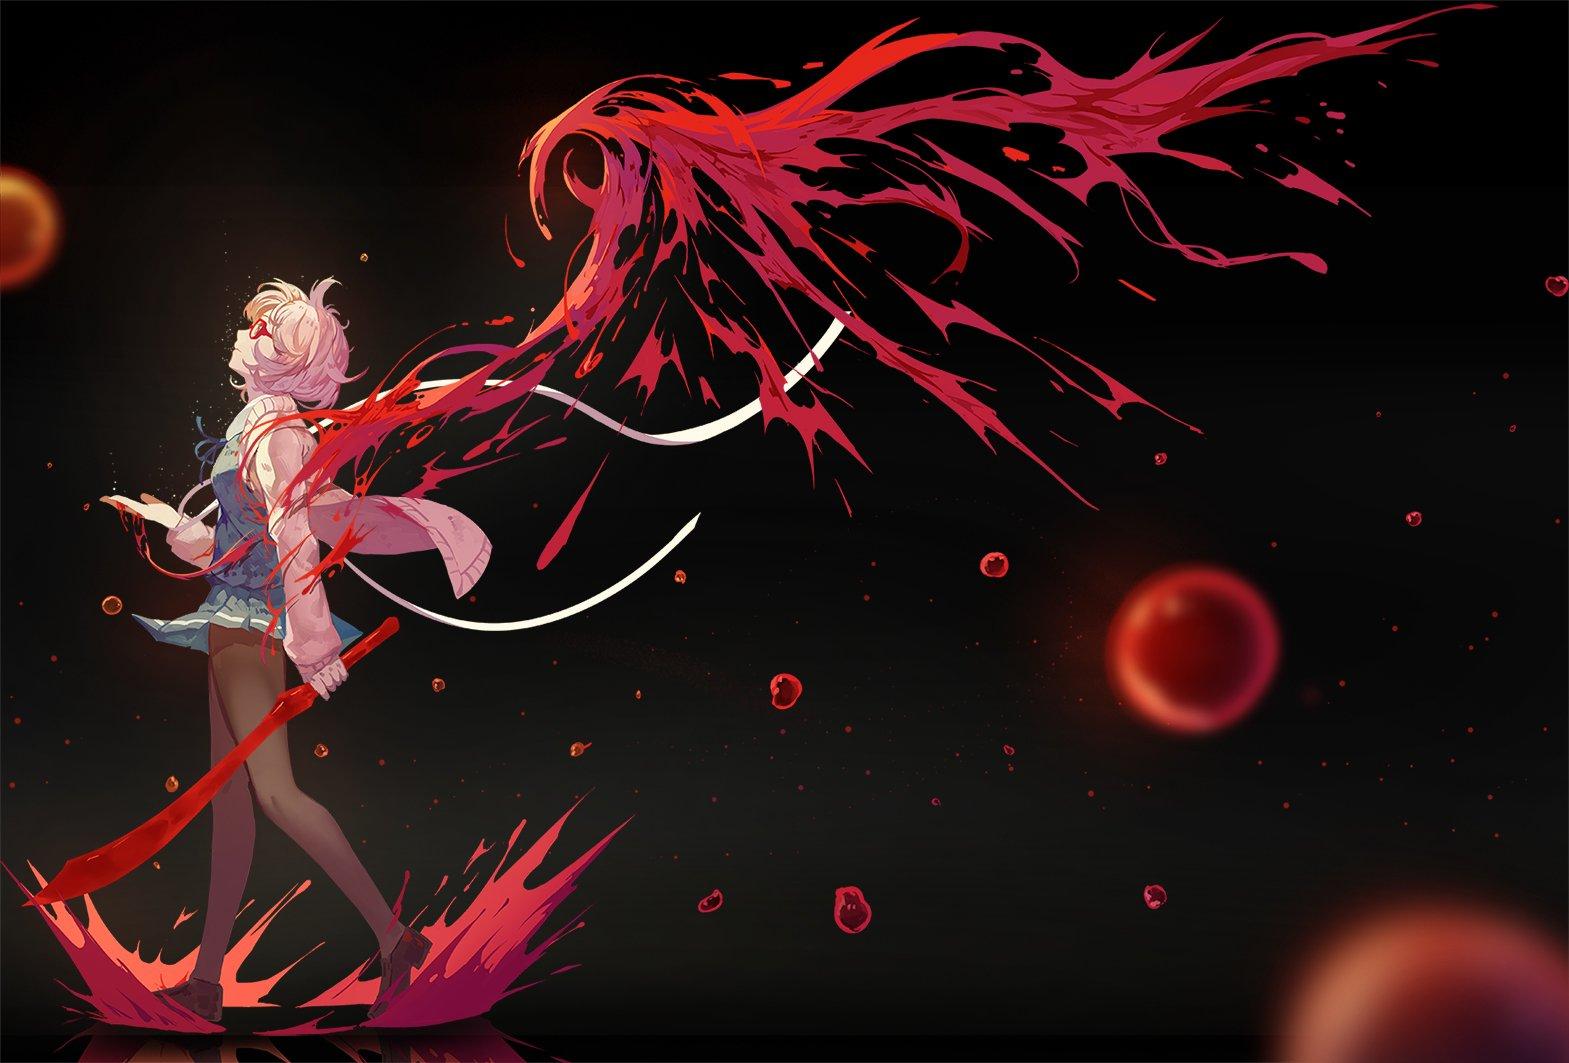 ~Wallpaper Anime~ Thumb-1920-655562